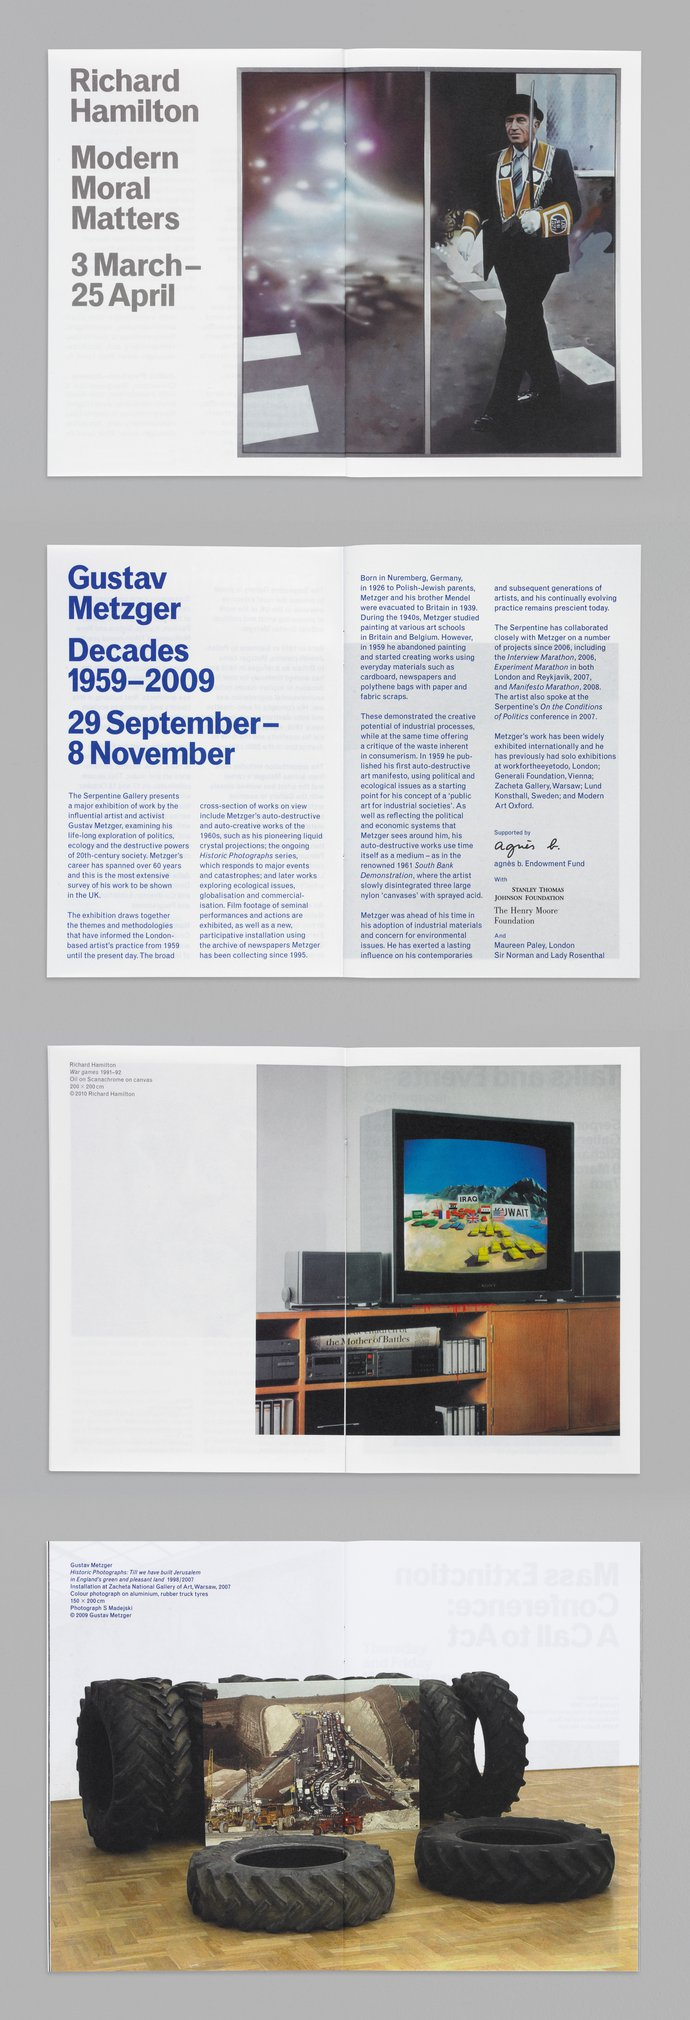 Serpentine Gallery – Identity, 2009, image 6